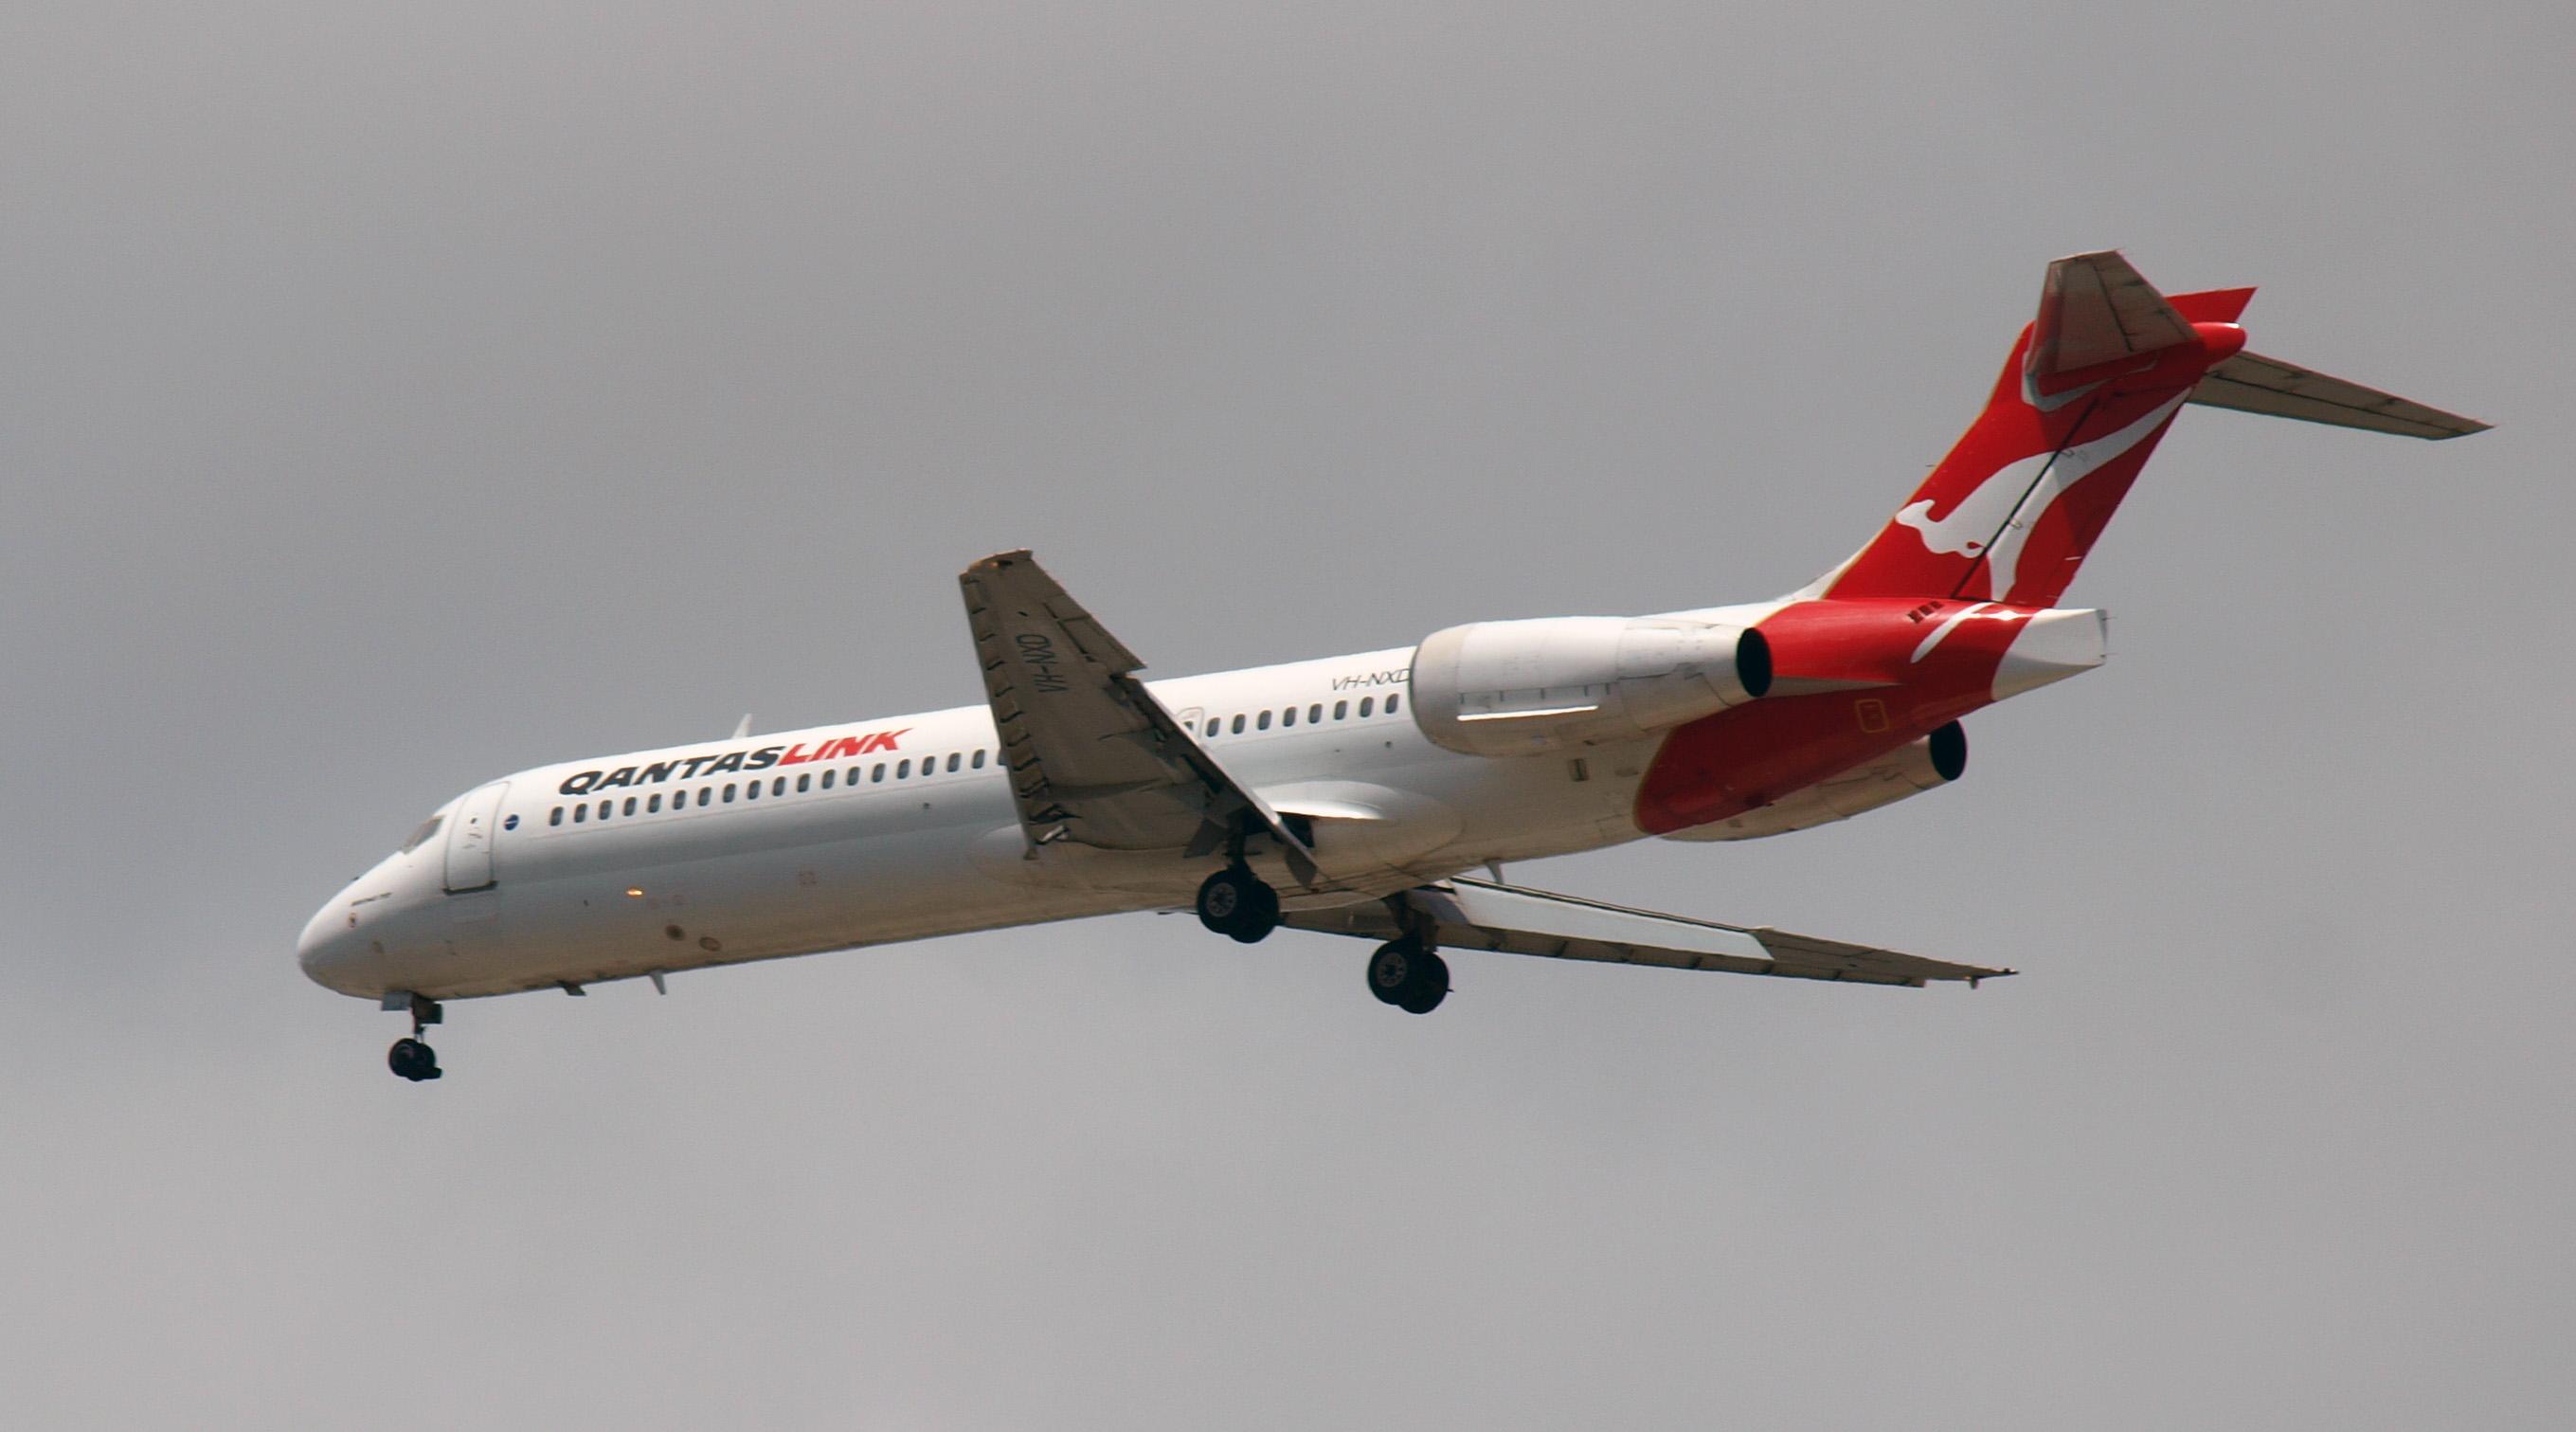 QantasLINK_717-200.JPG